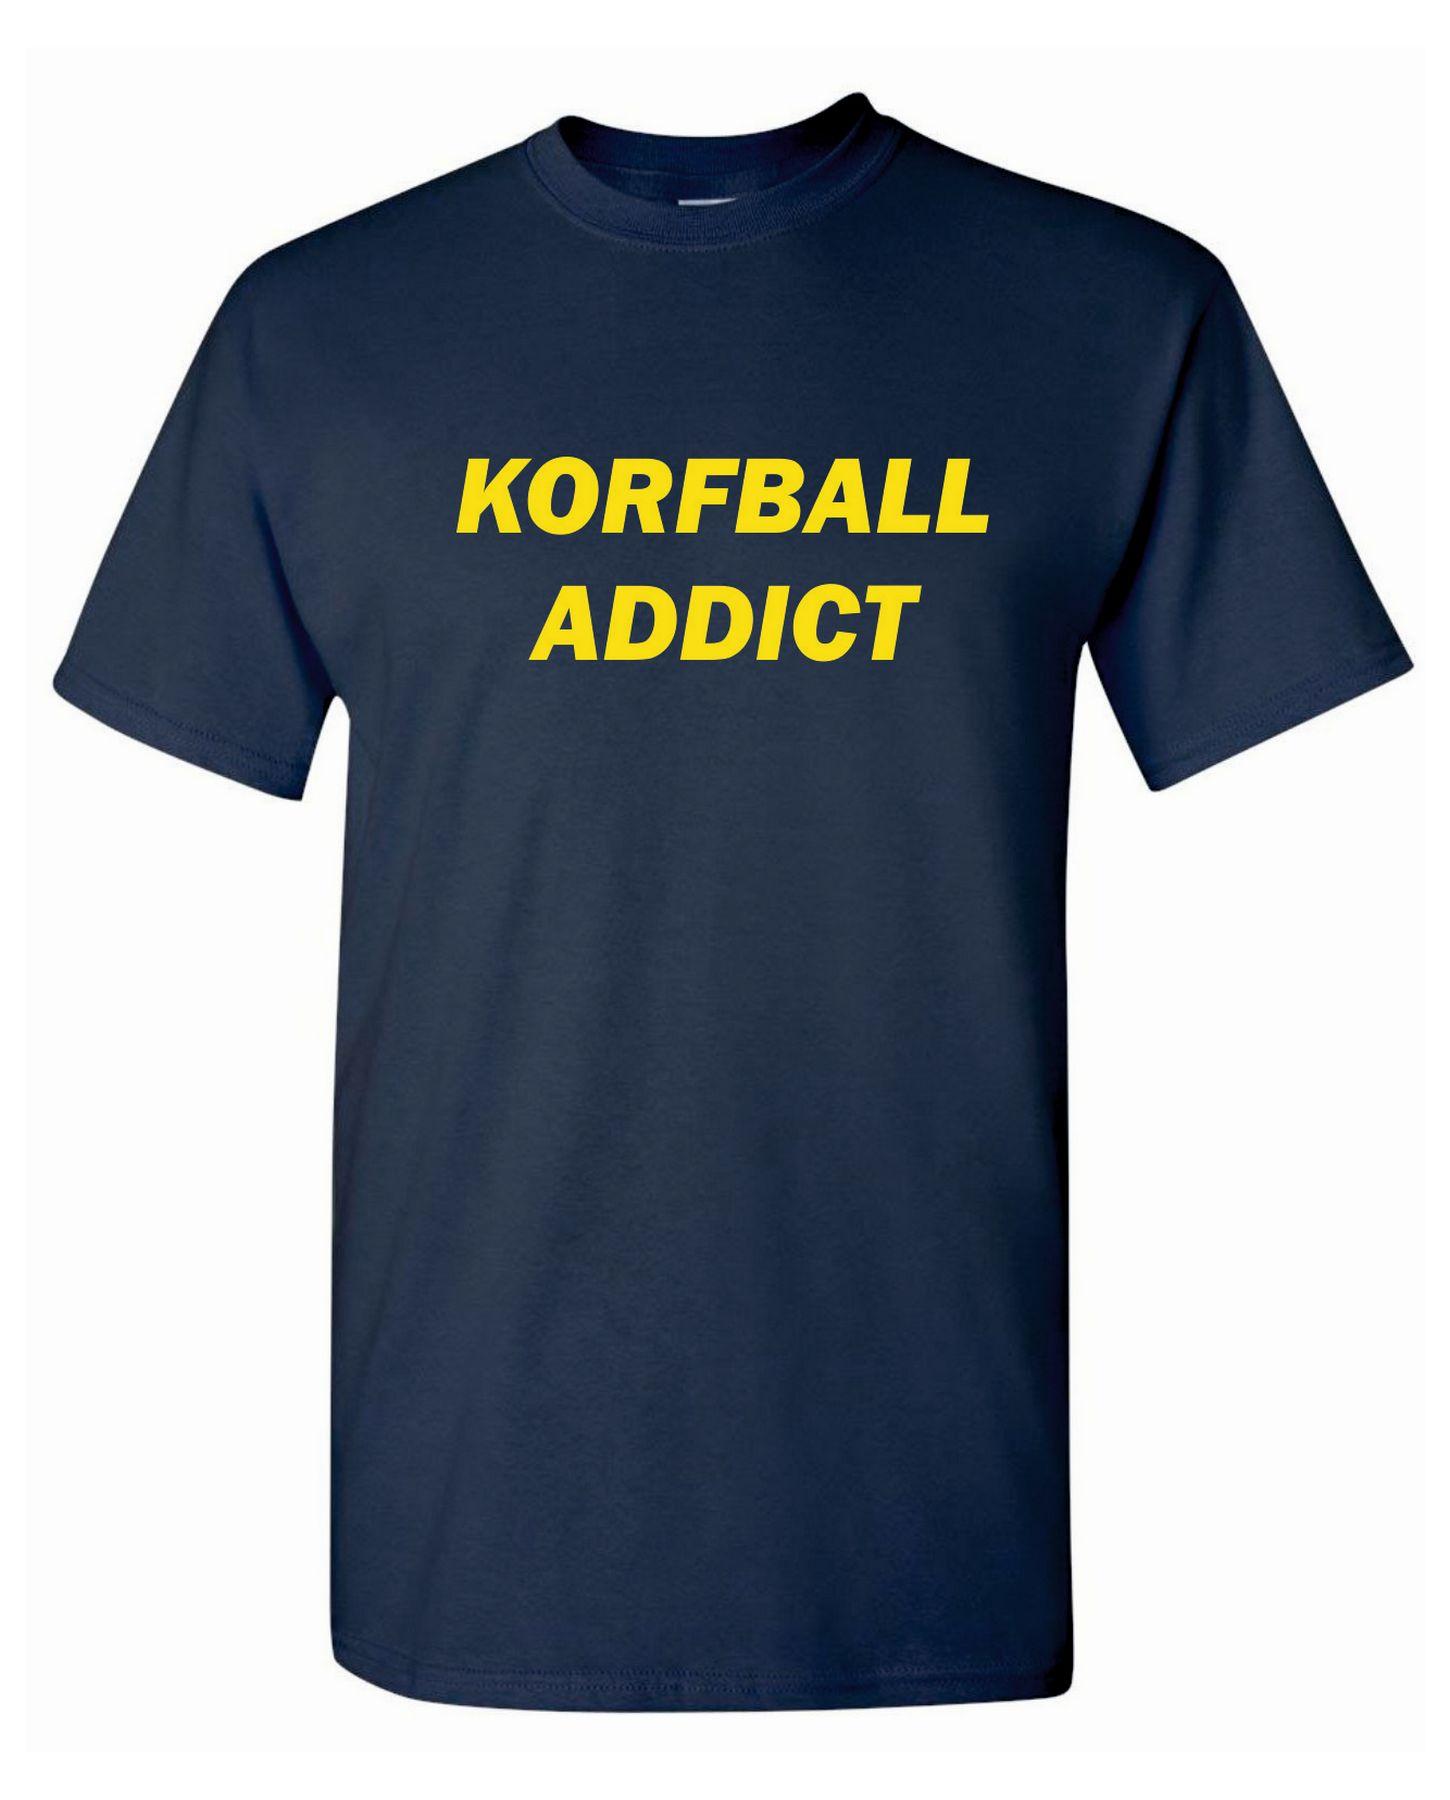 Korfball Addict